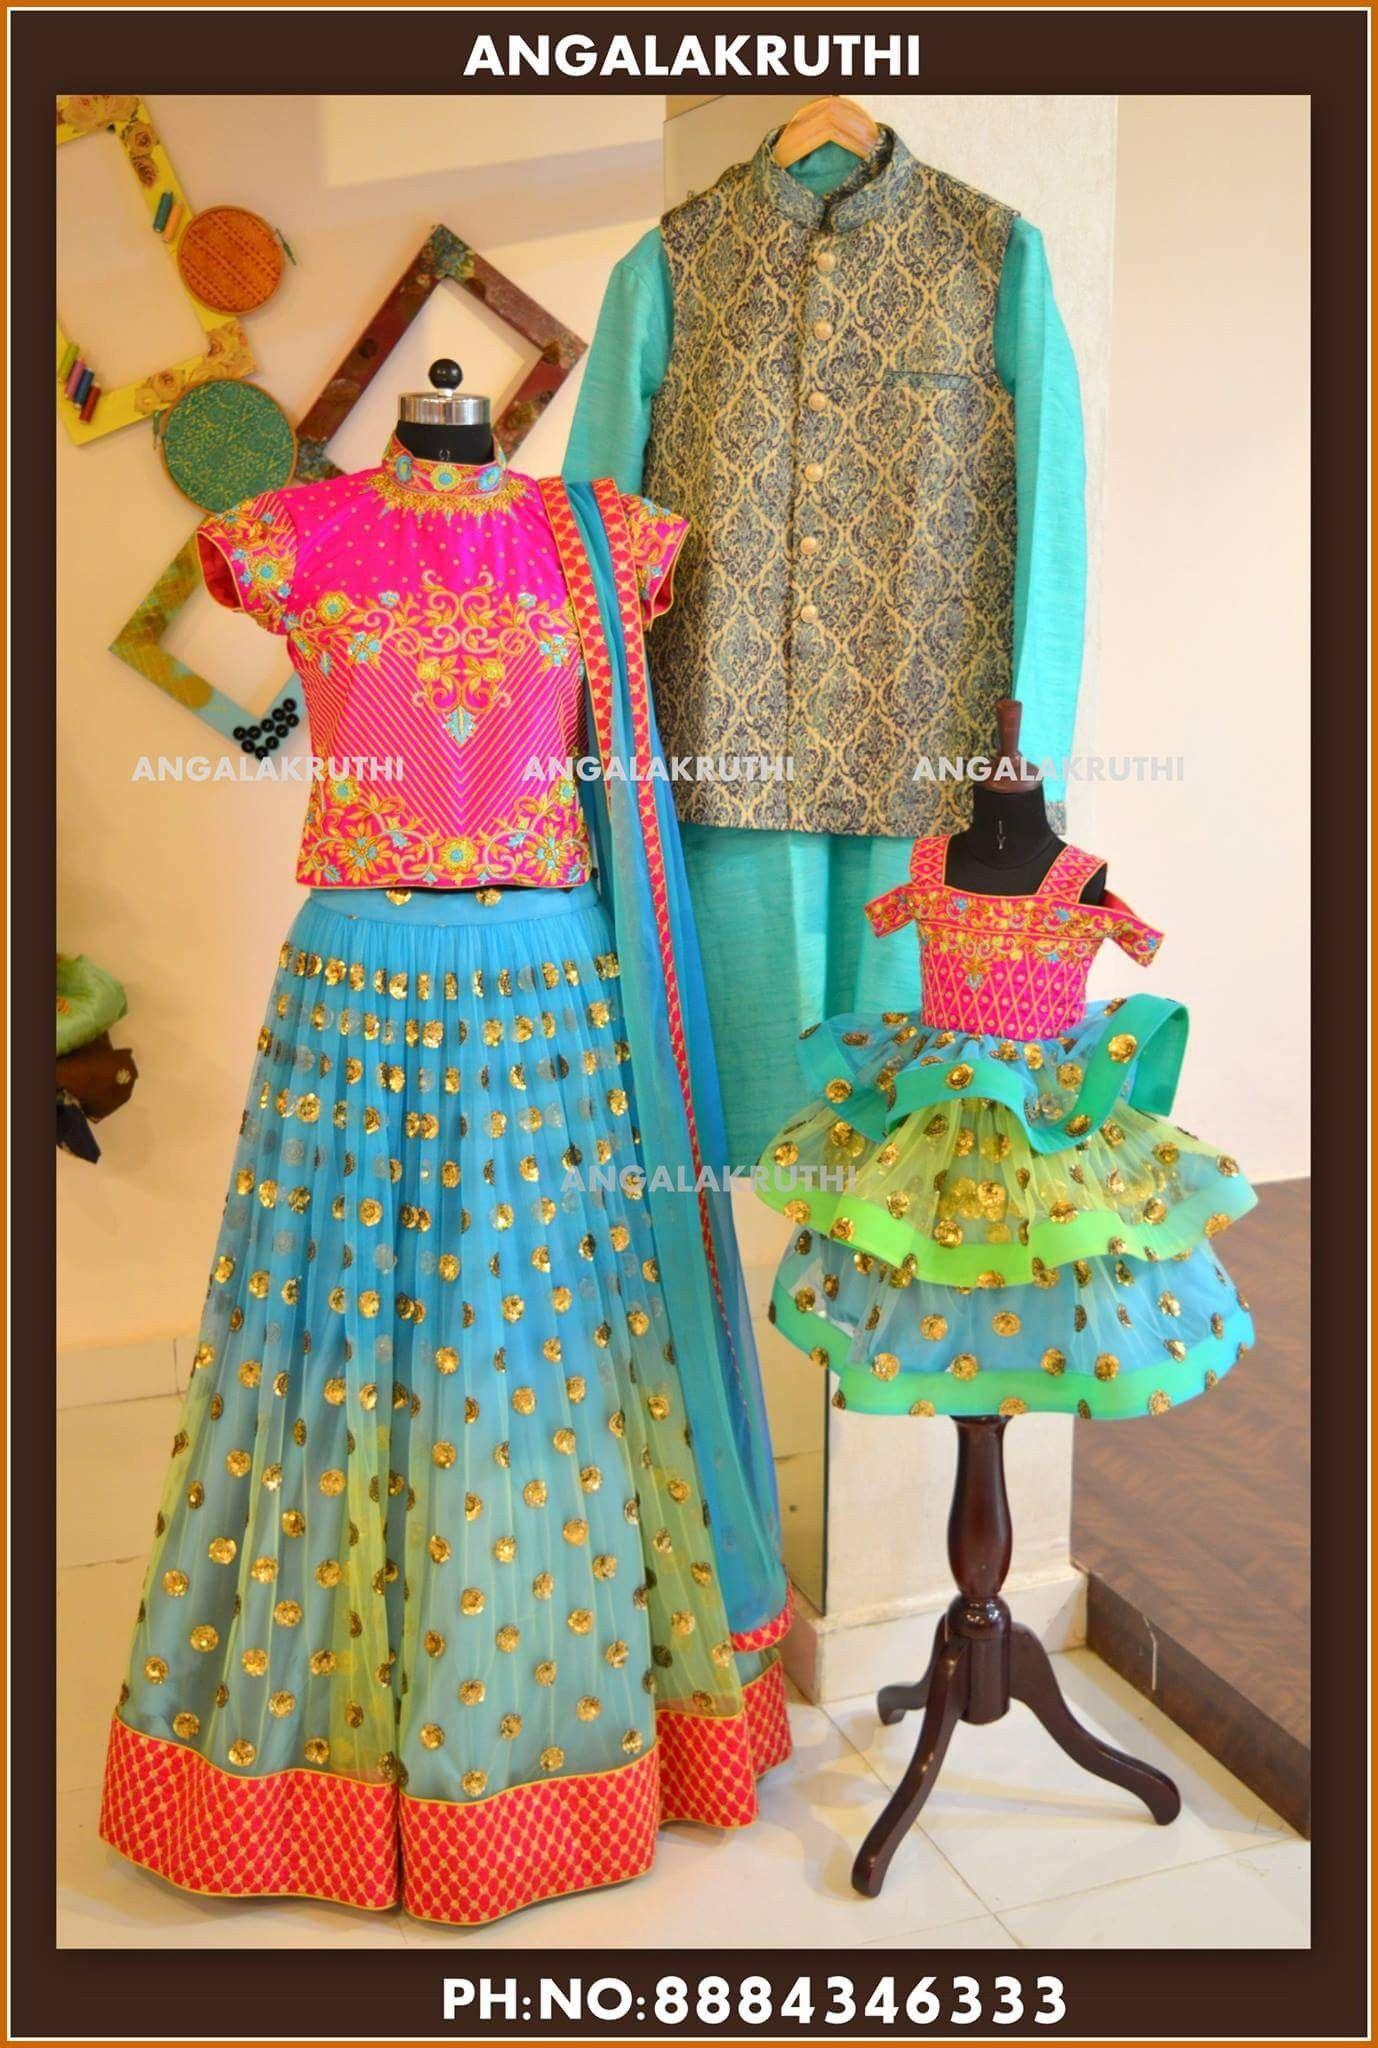 f04a775e99 Family matching dress designs by Angalakruthi boutique Bangalore  Watsapp:+91-8884347333 #mother